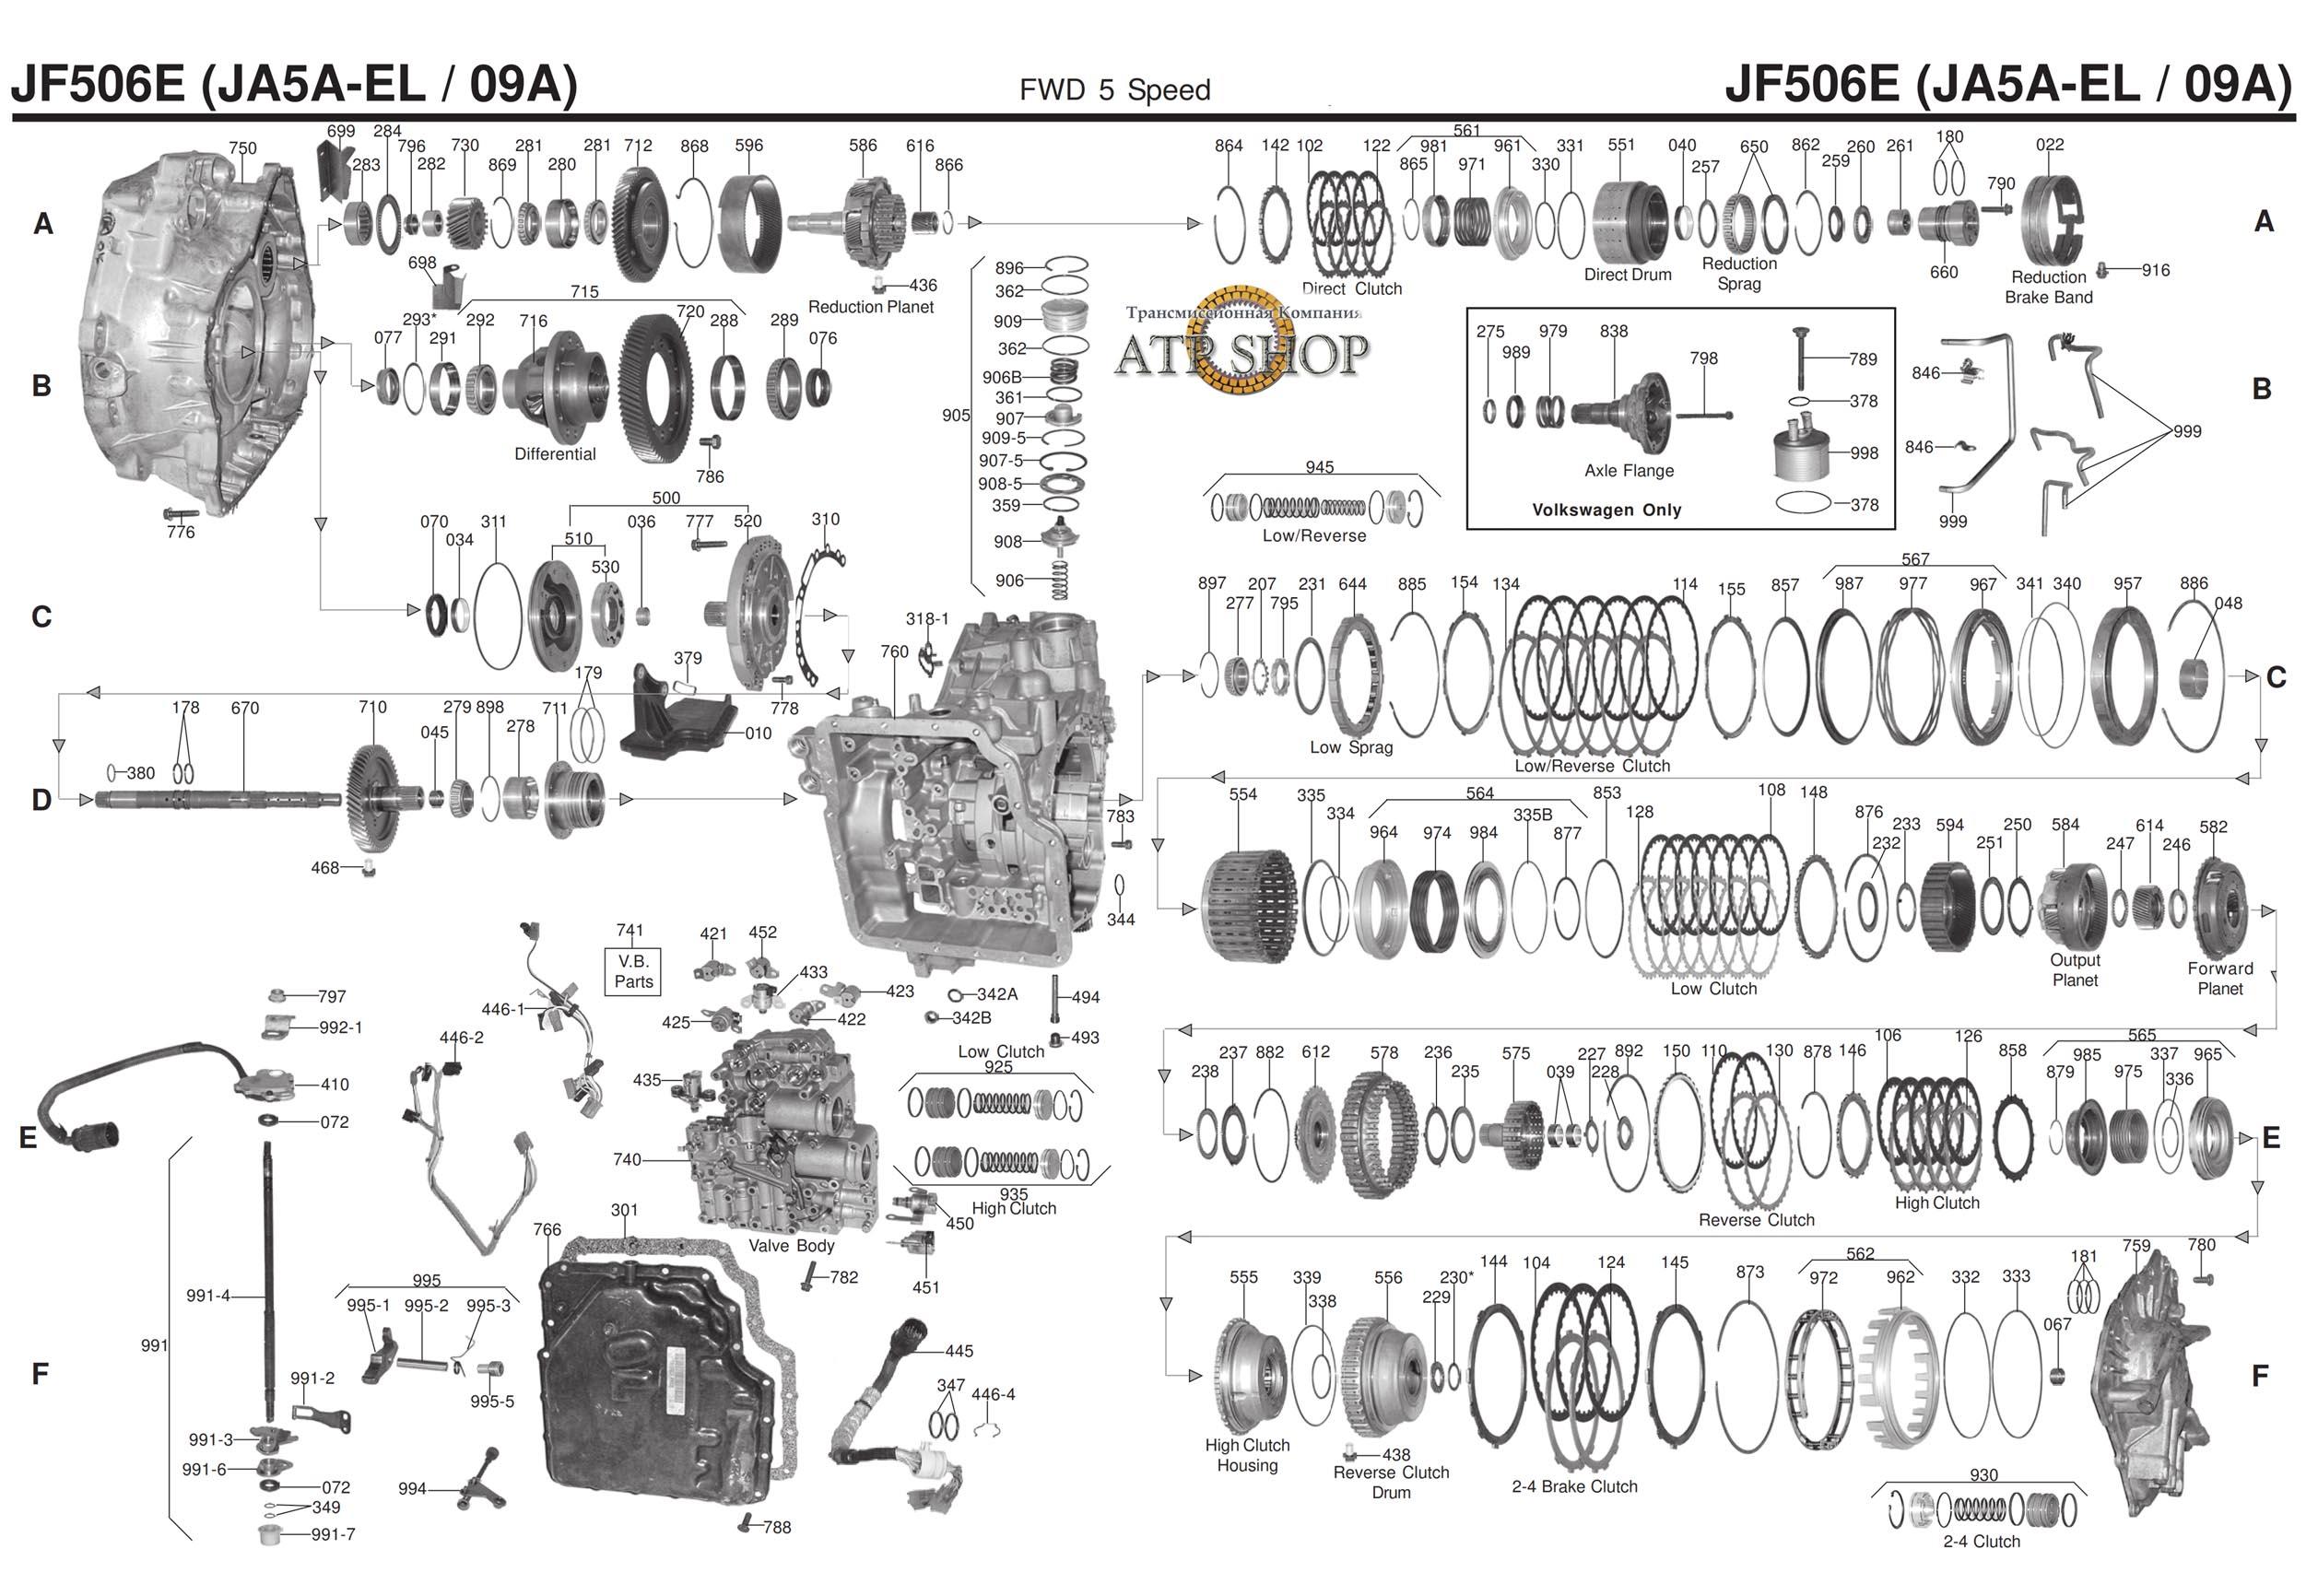 09a Jf506e